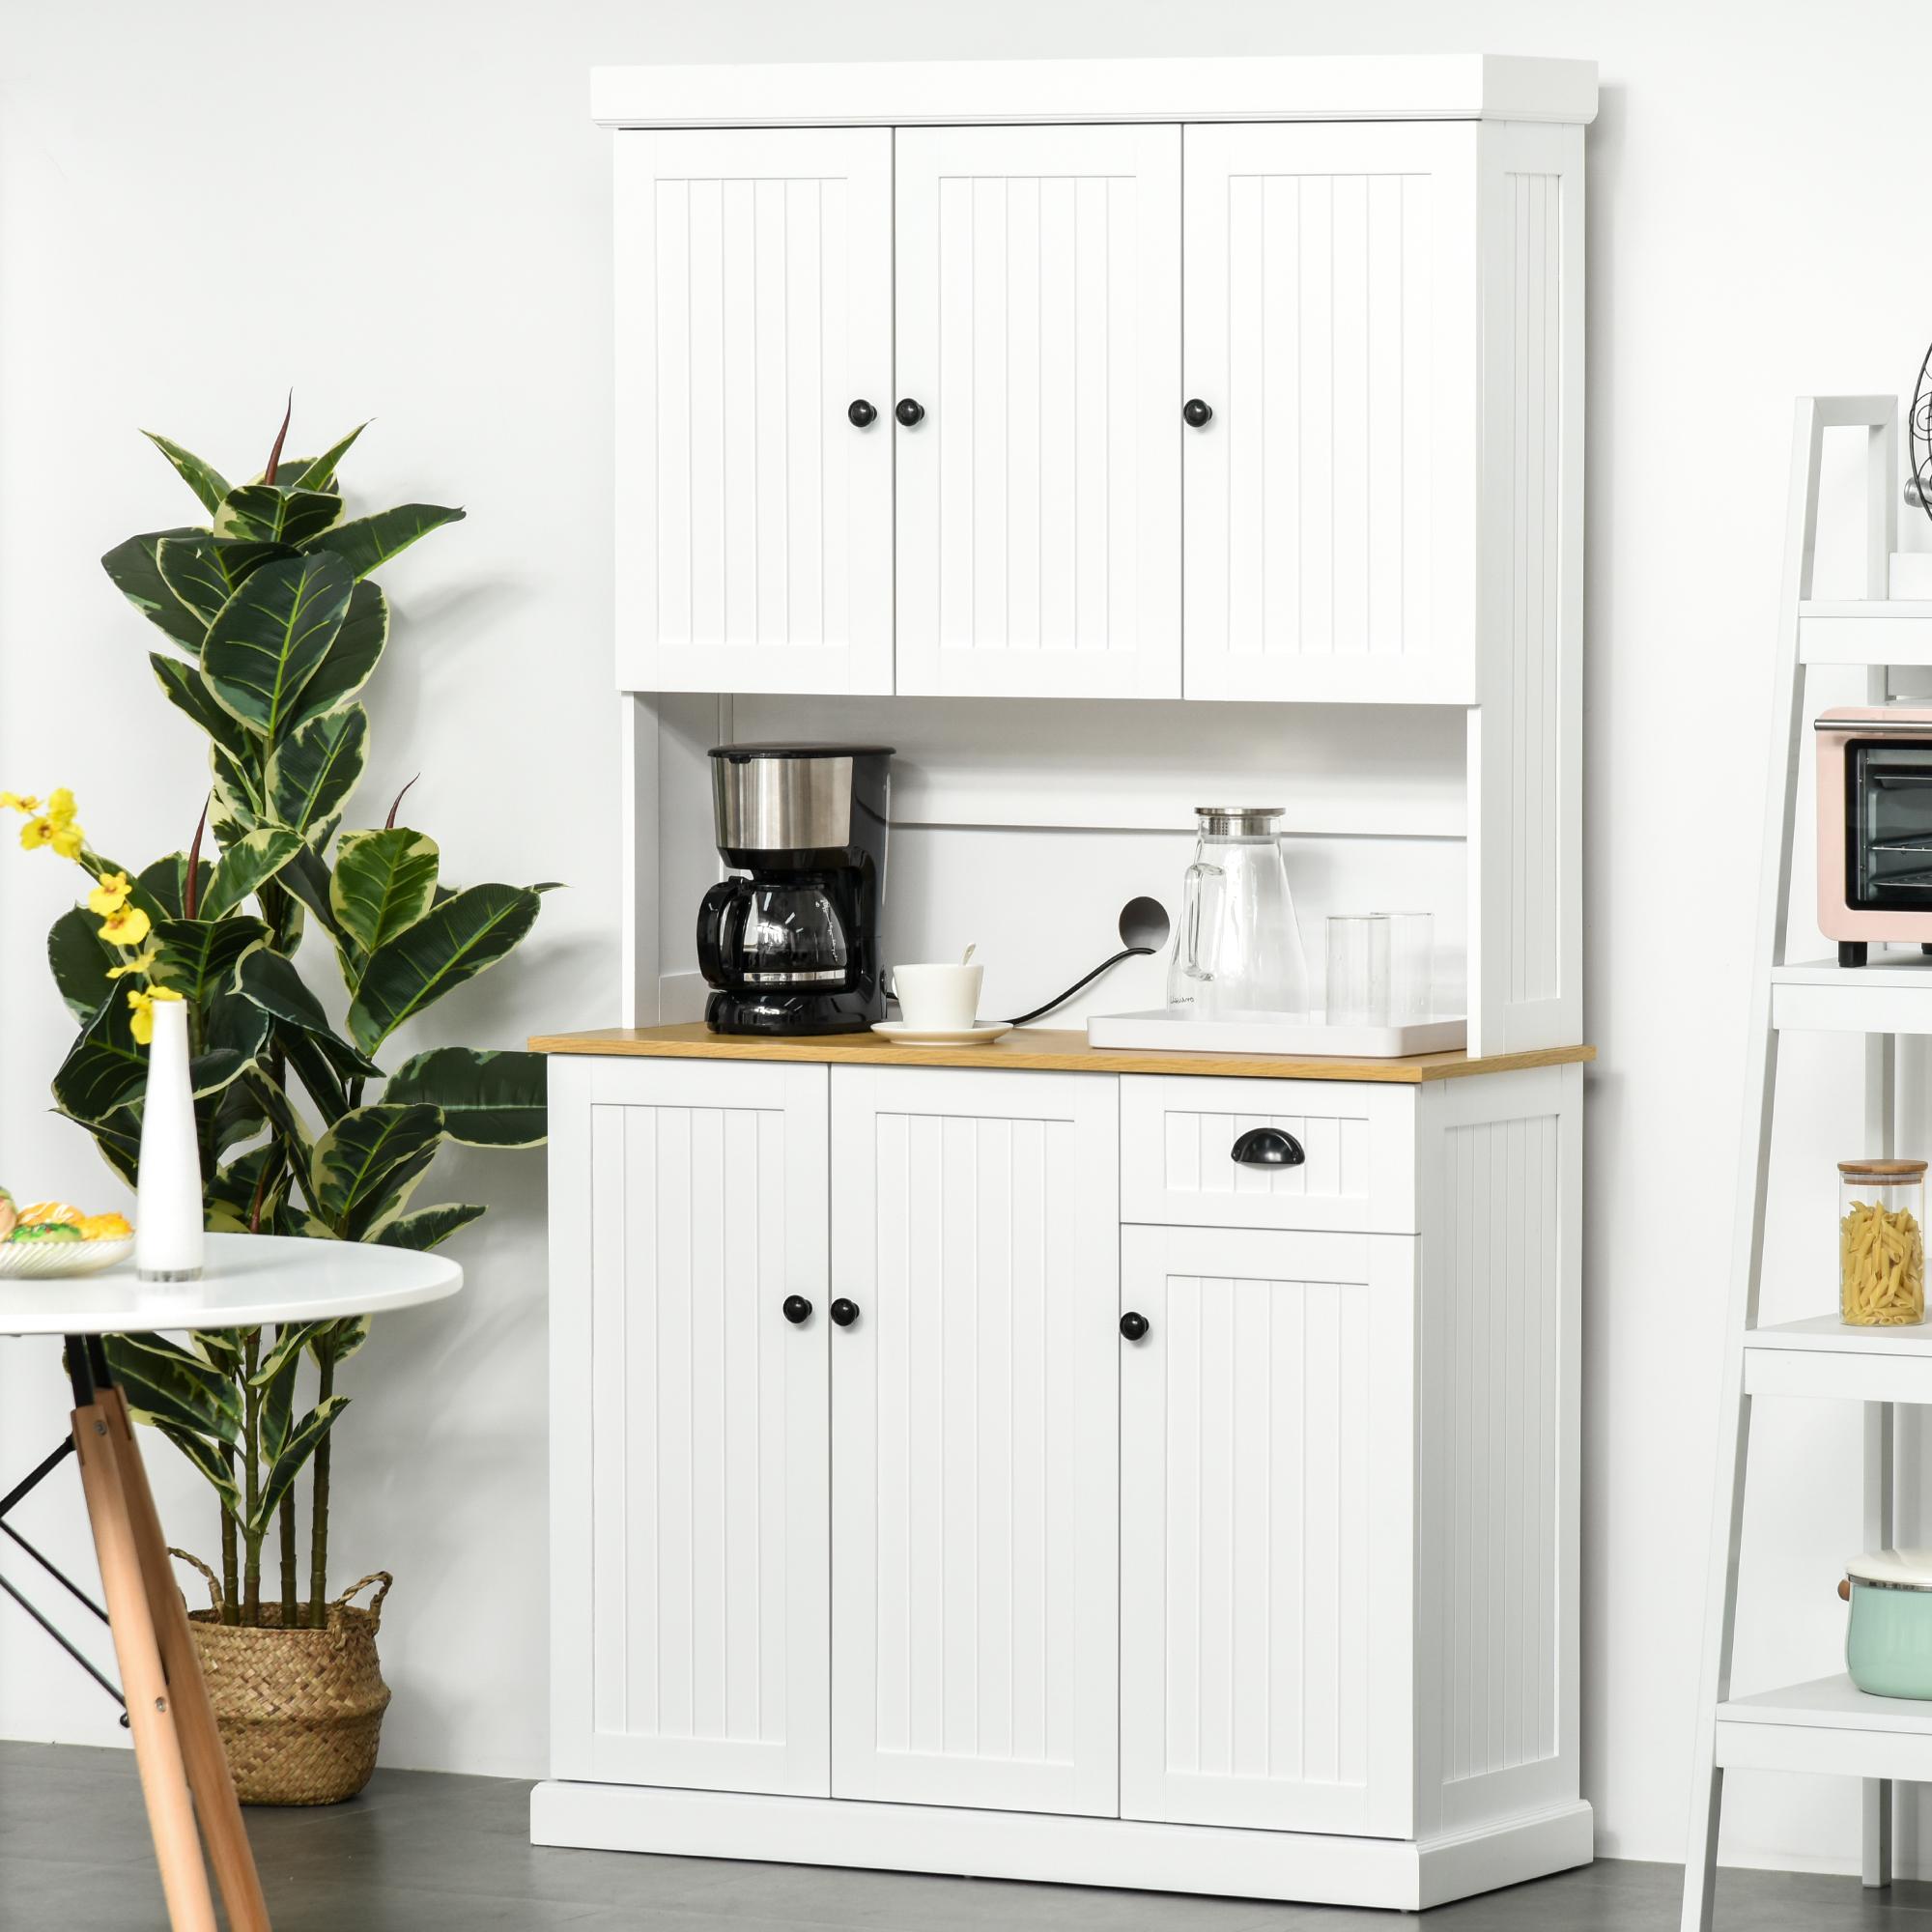 Homcom 71 Wood Kitchen Pantry Storage Cabinet Microwave Oven Free Standing 842525138307 Ebay